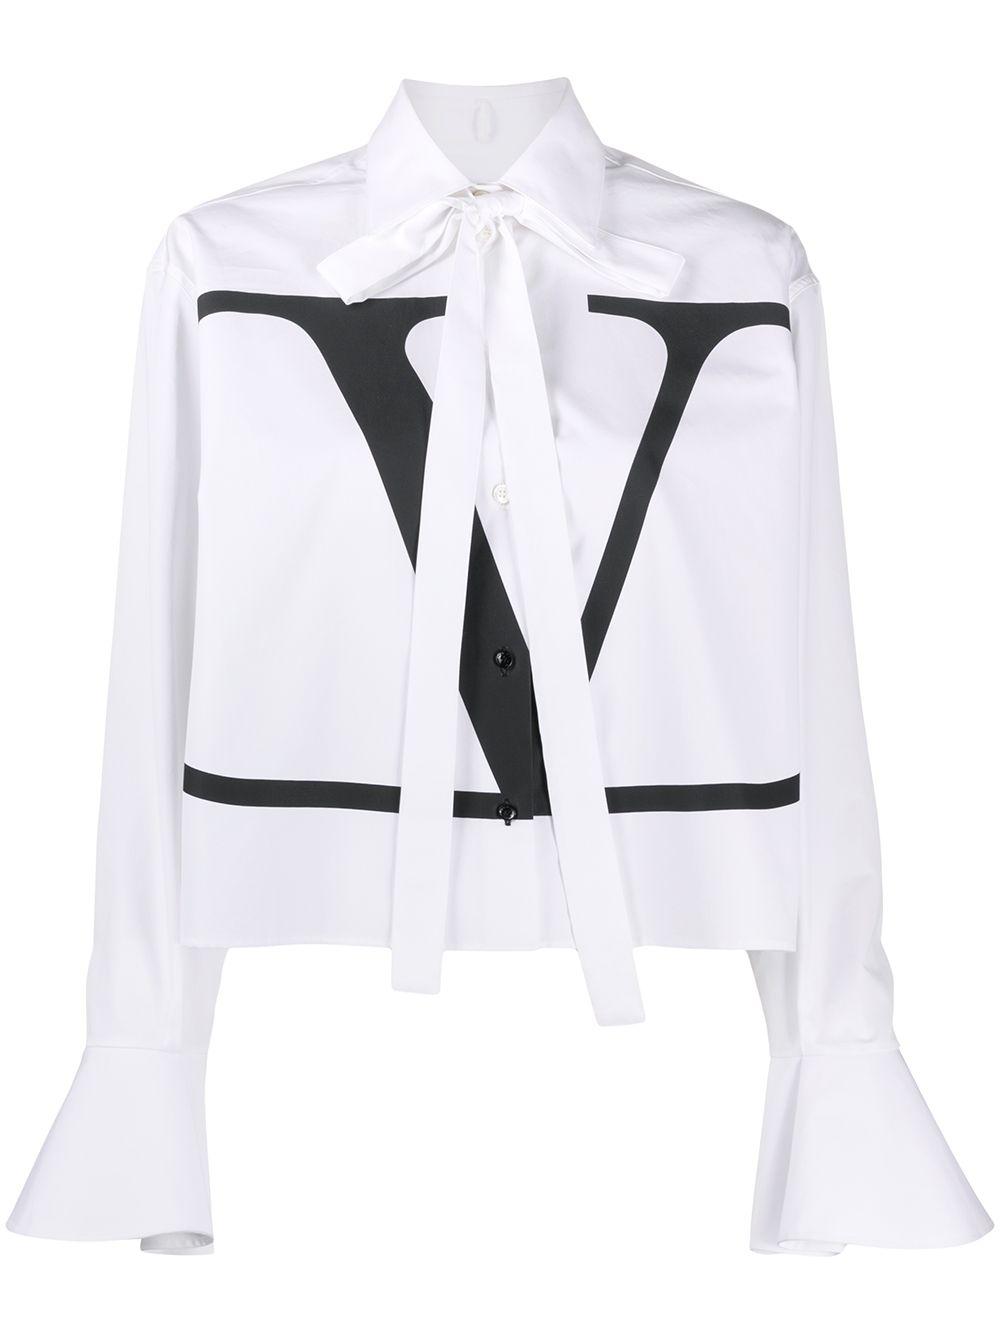 Vlogo Cotton Shirt